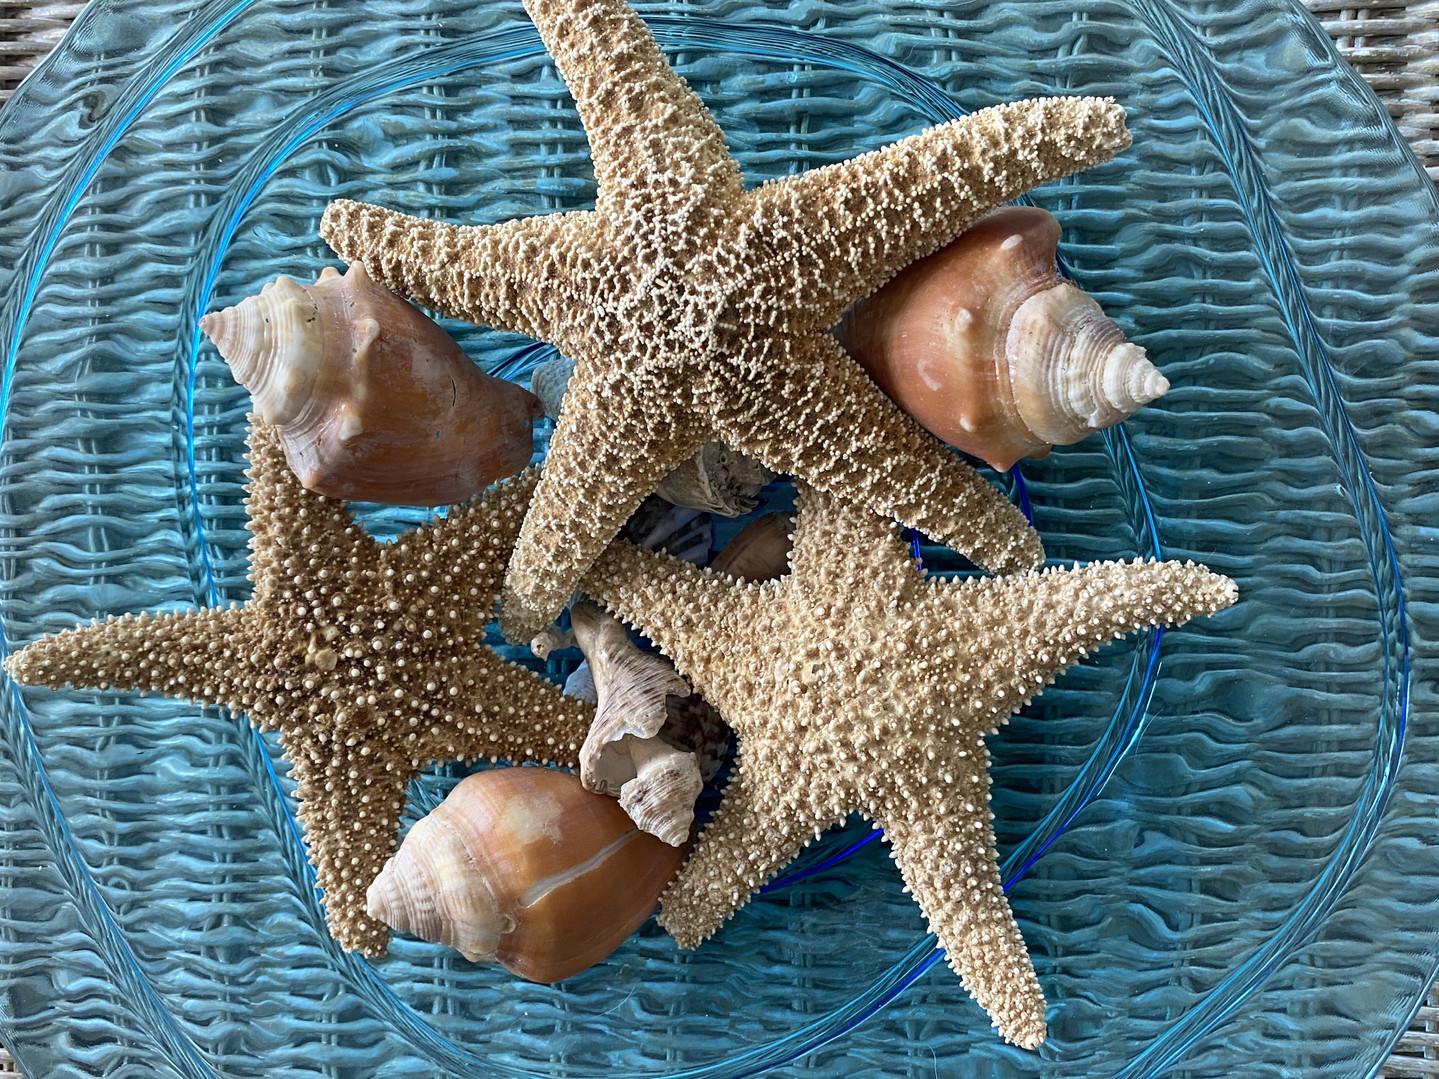 Shells and starfish